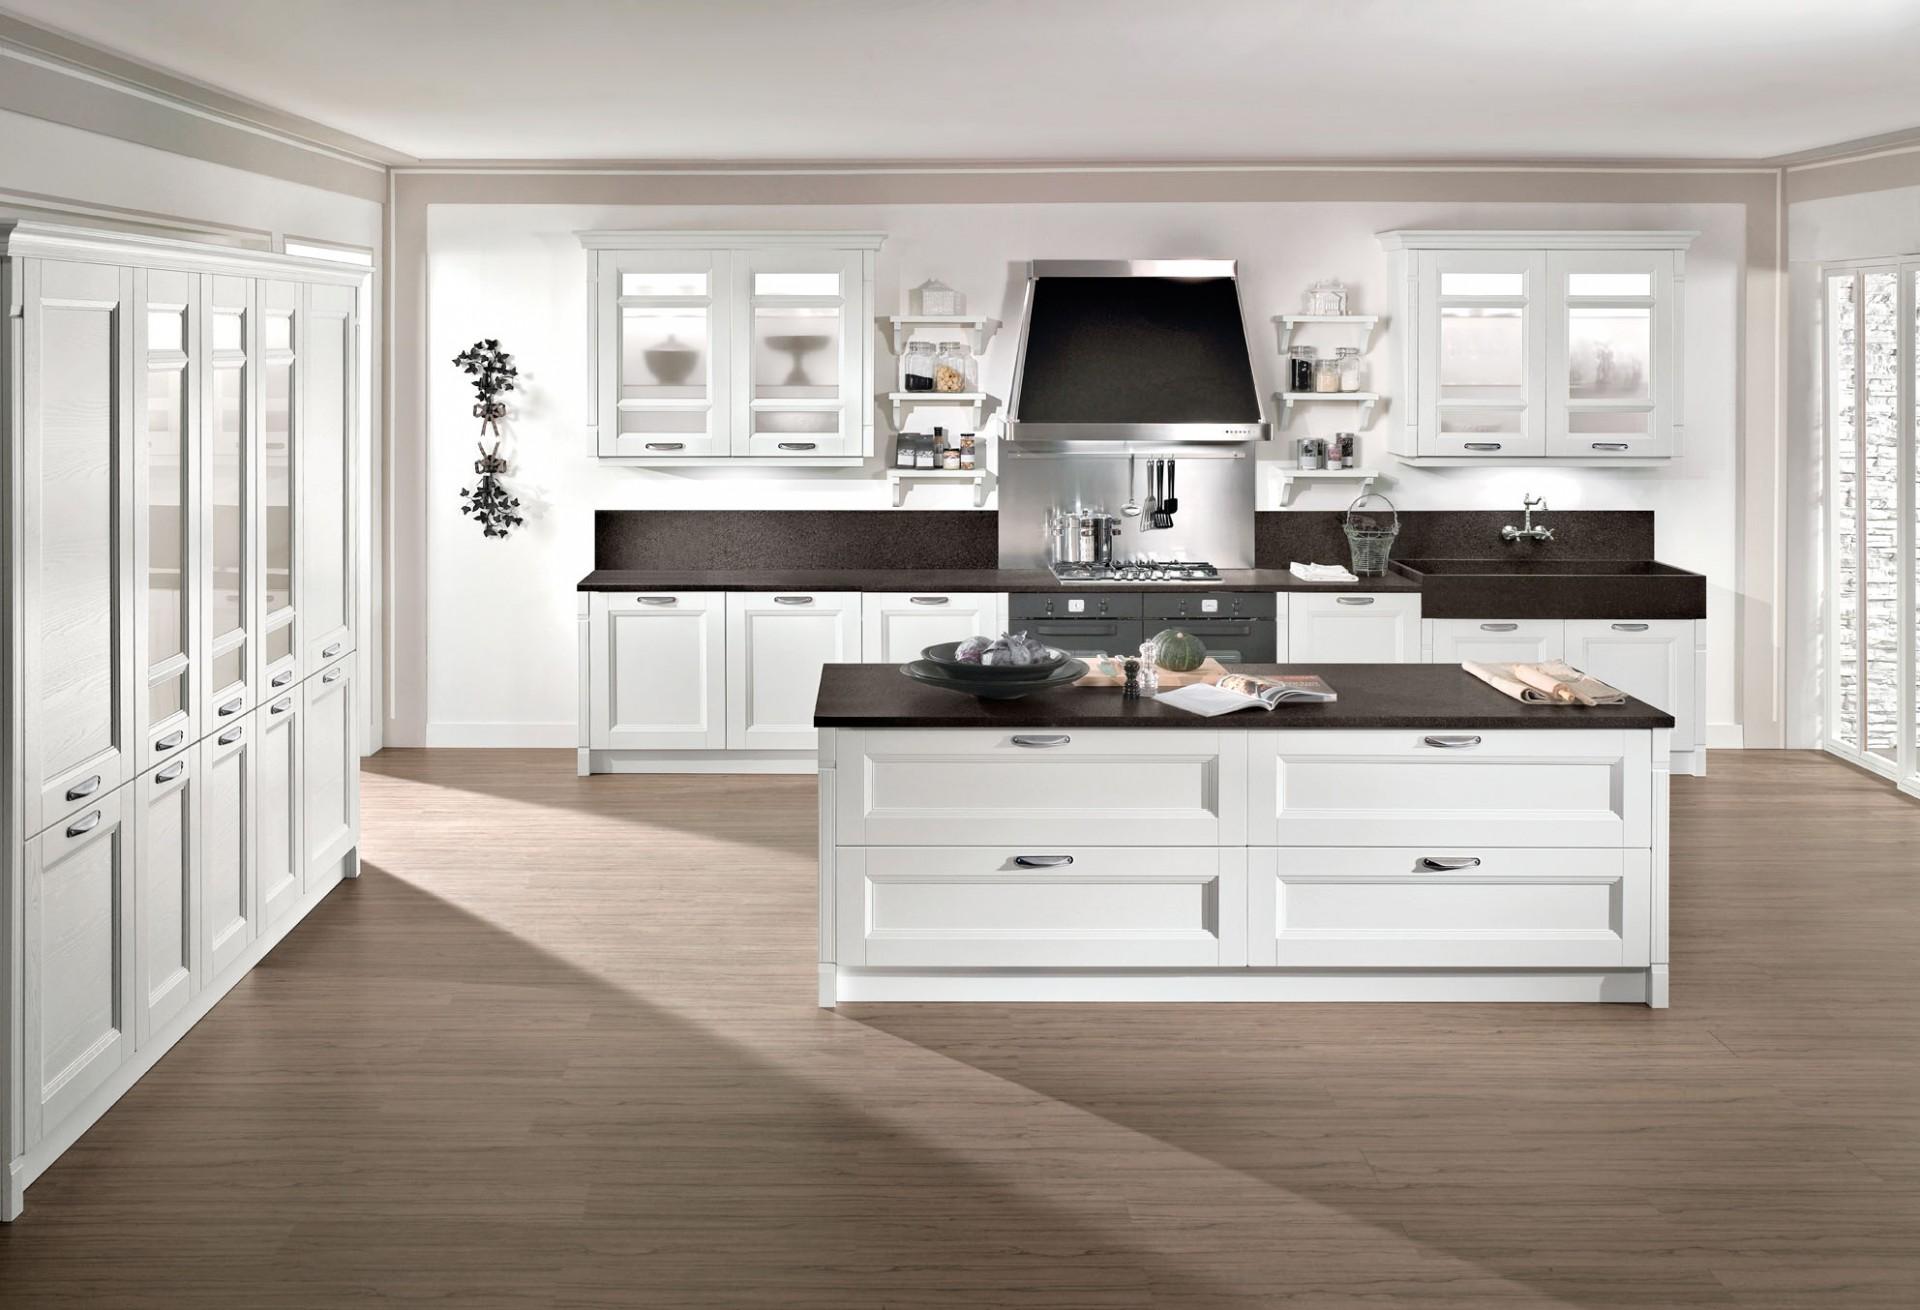 Cucine pirani mobili for Cucina italiana mobili